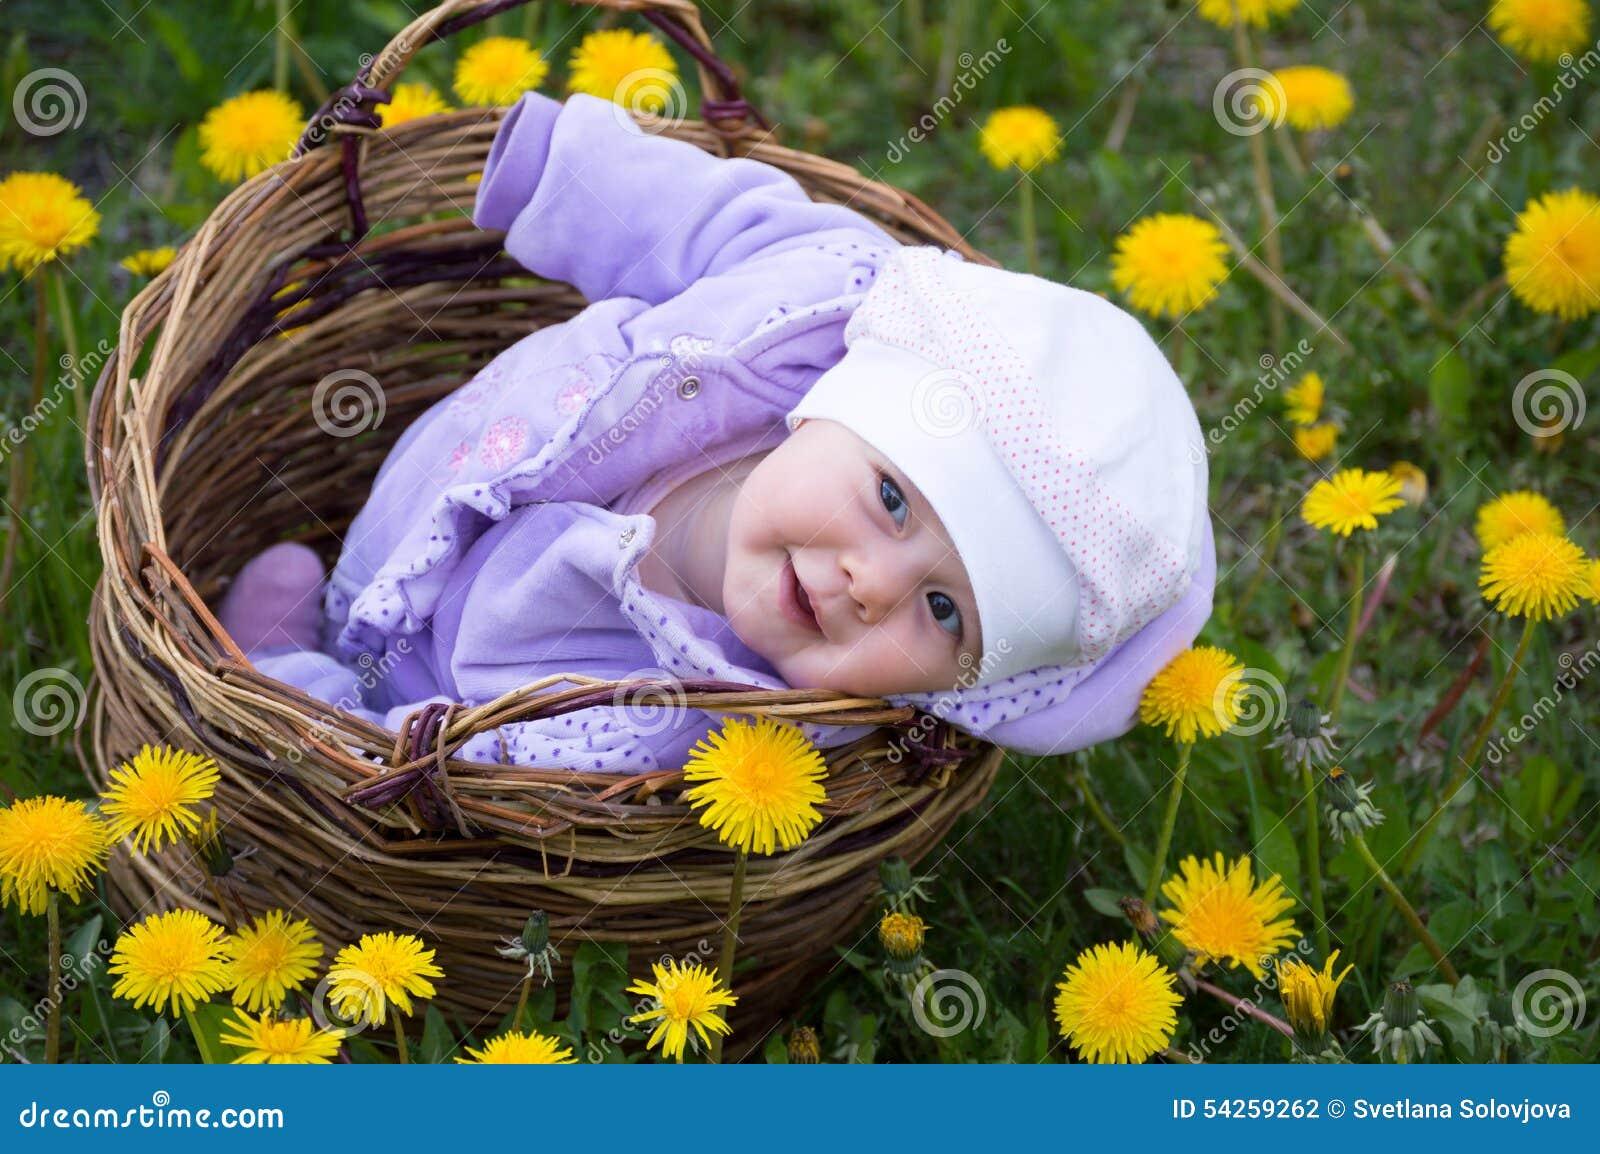 Infant girl in basket